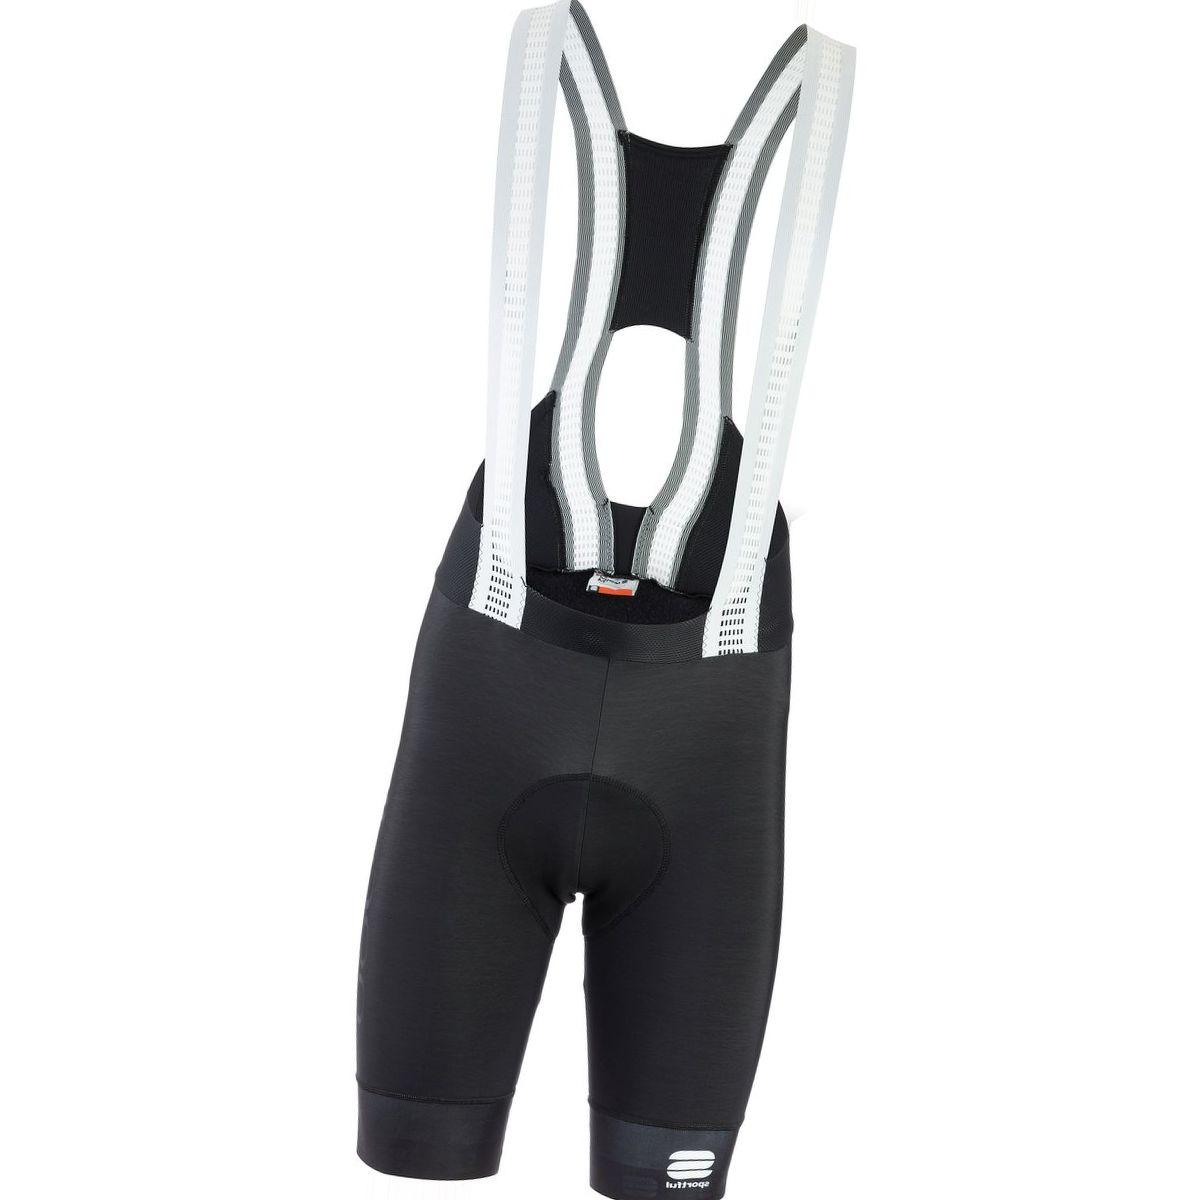 Sportful Fiandre No-Rain Pro Bib Short - Men's